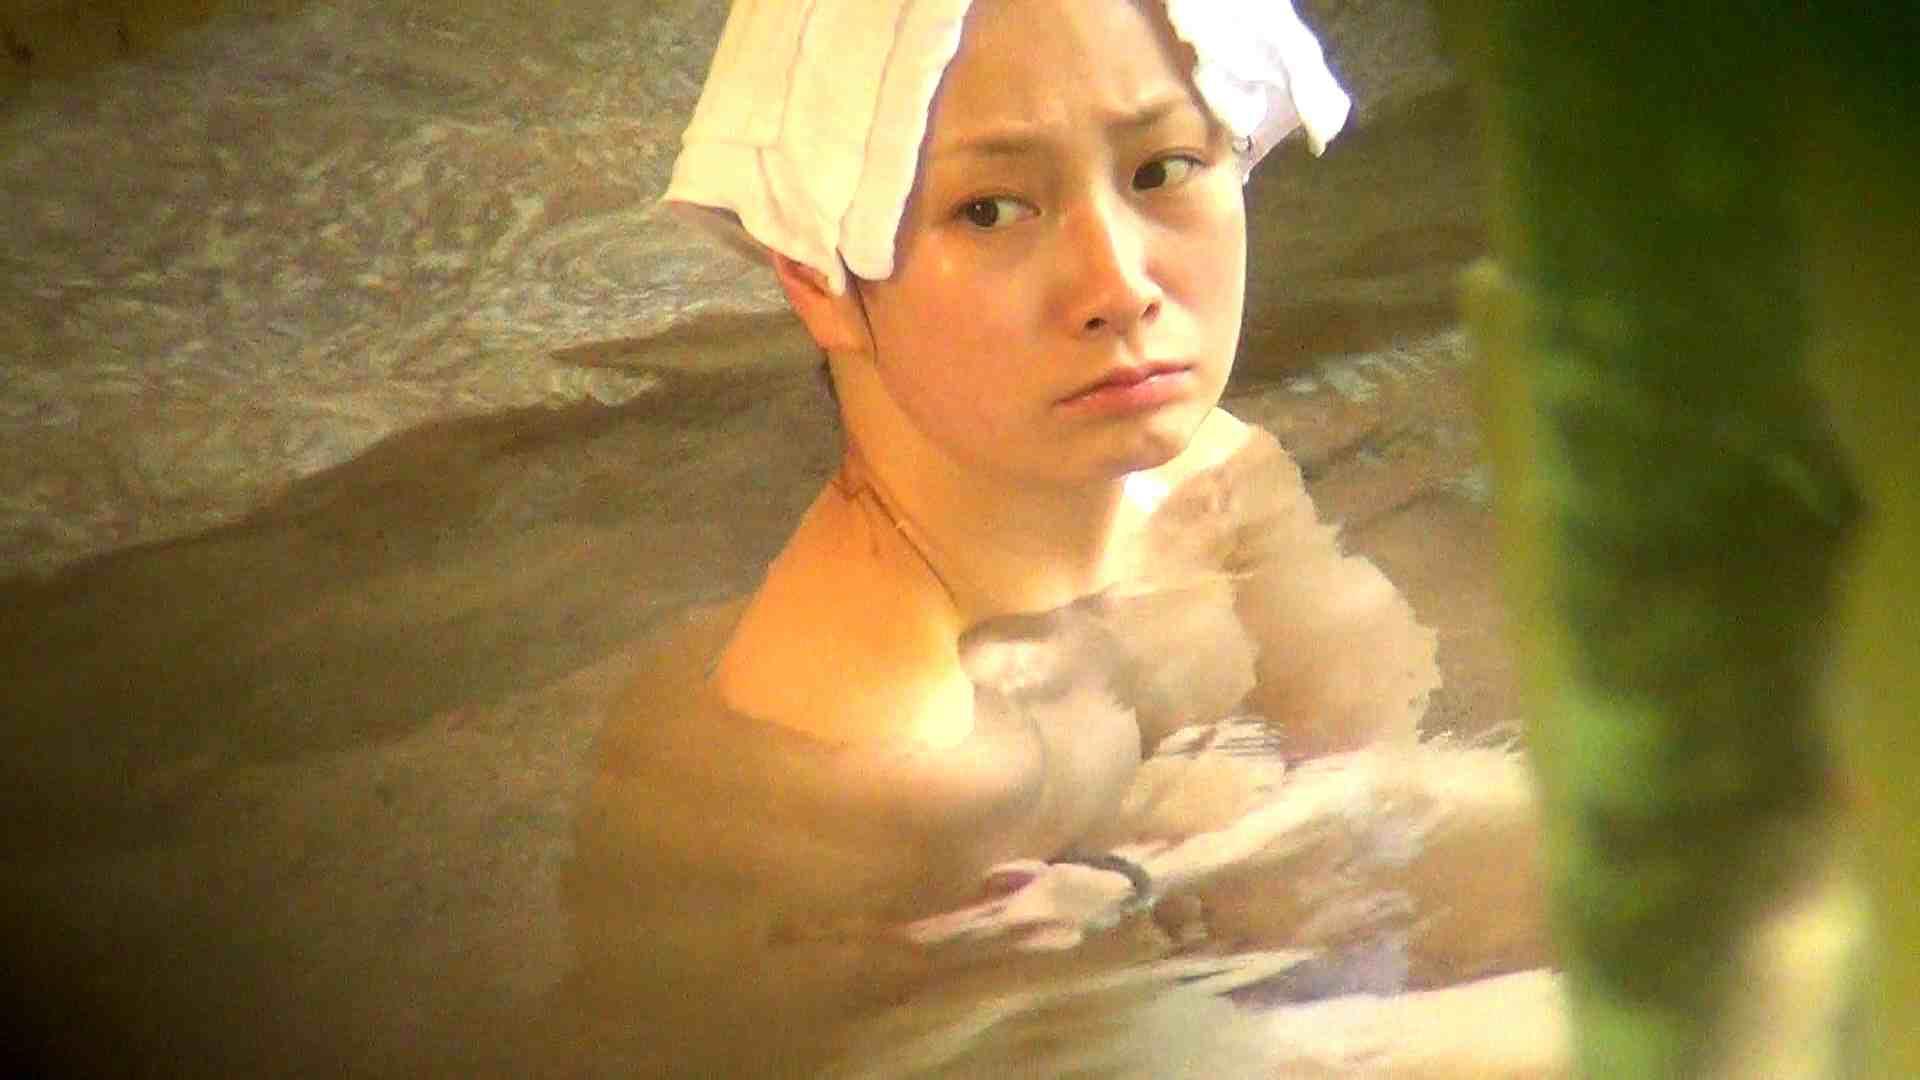 Aquaな露天風呂Vol.266 盗撮映像  83Pix 80